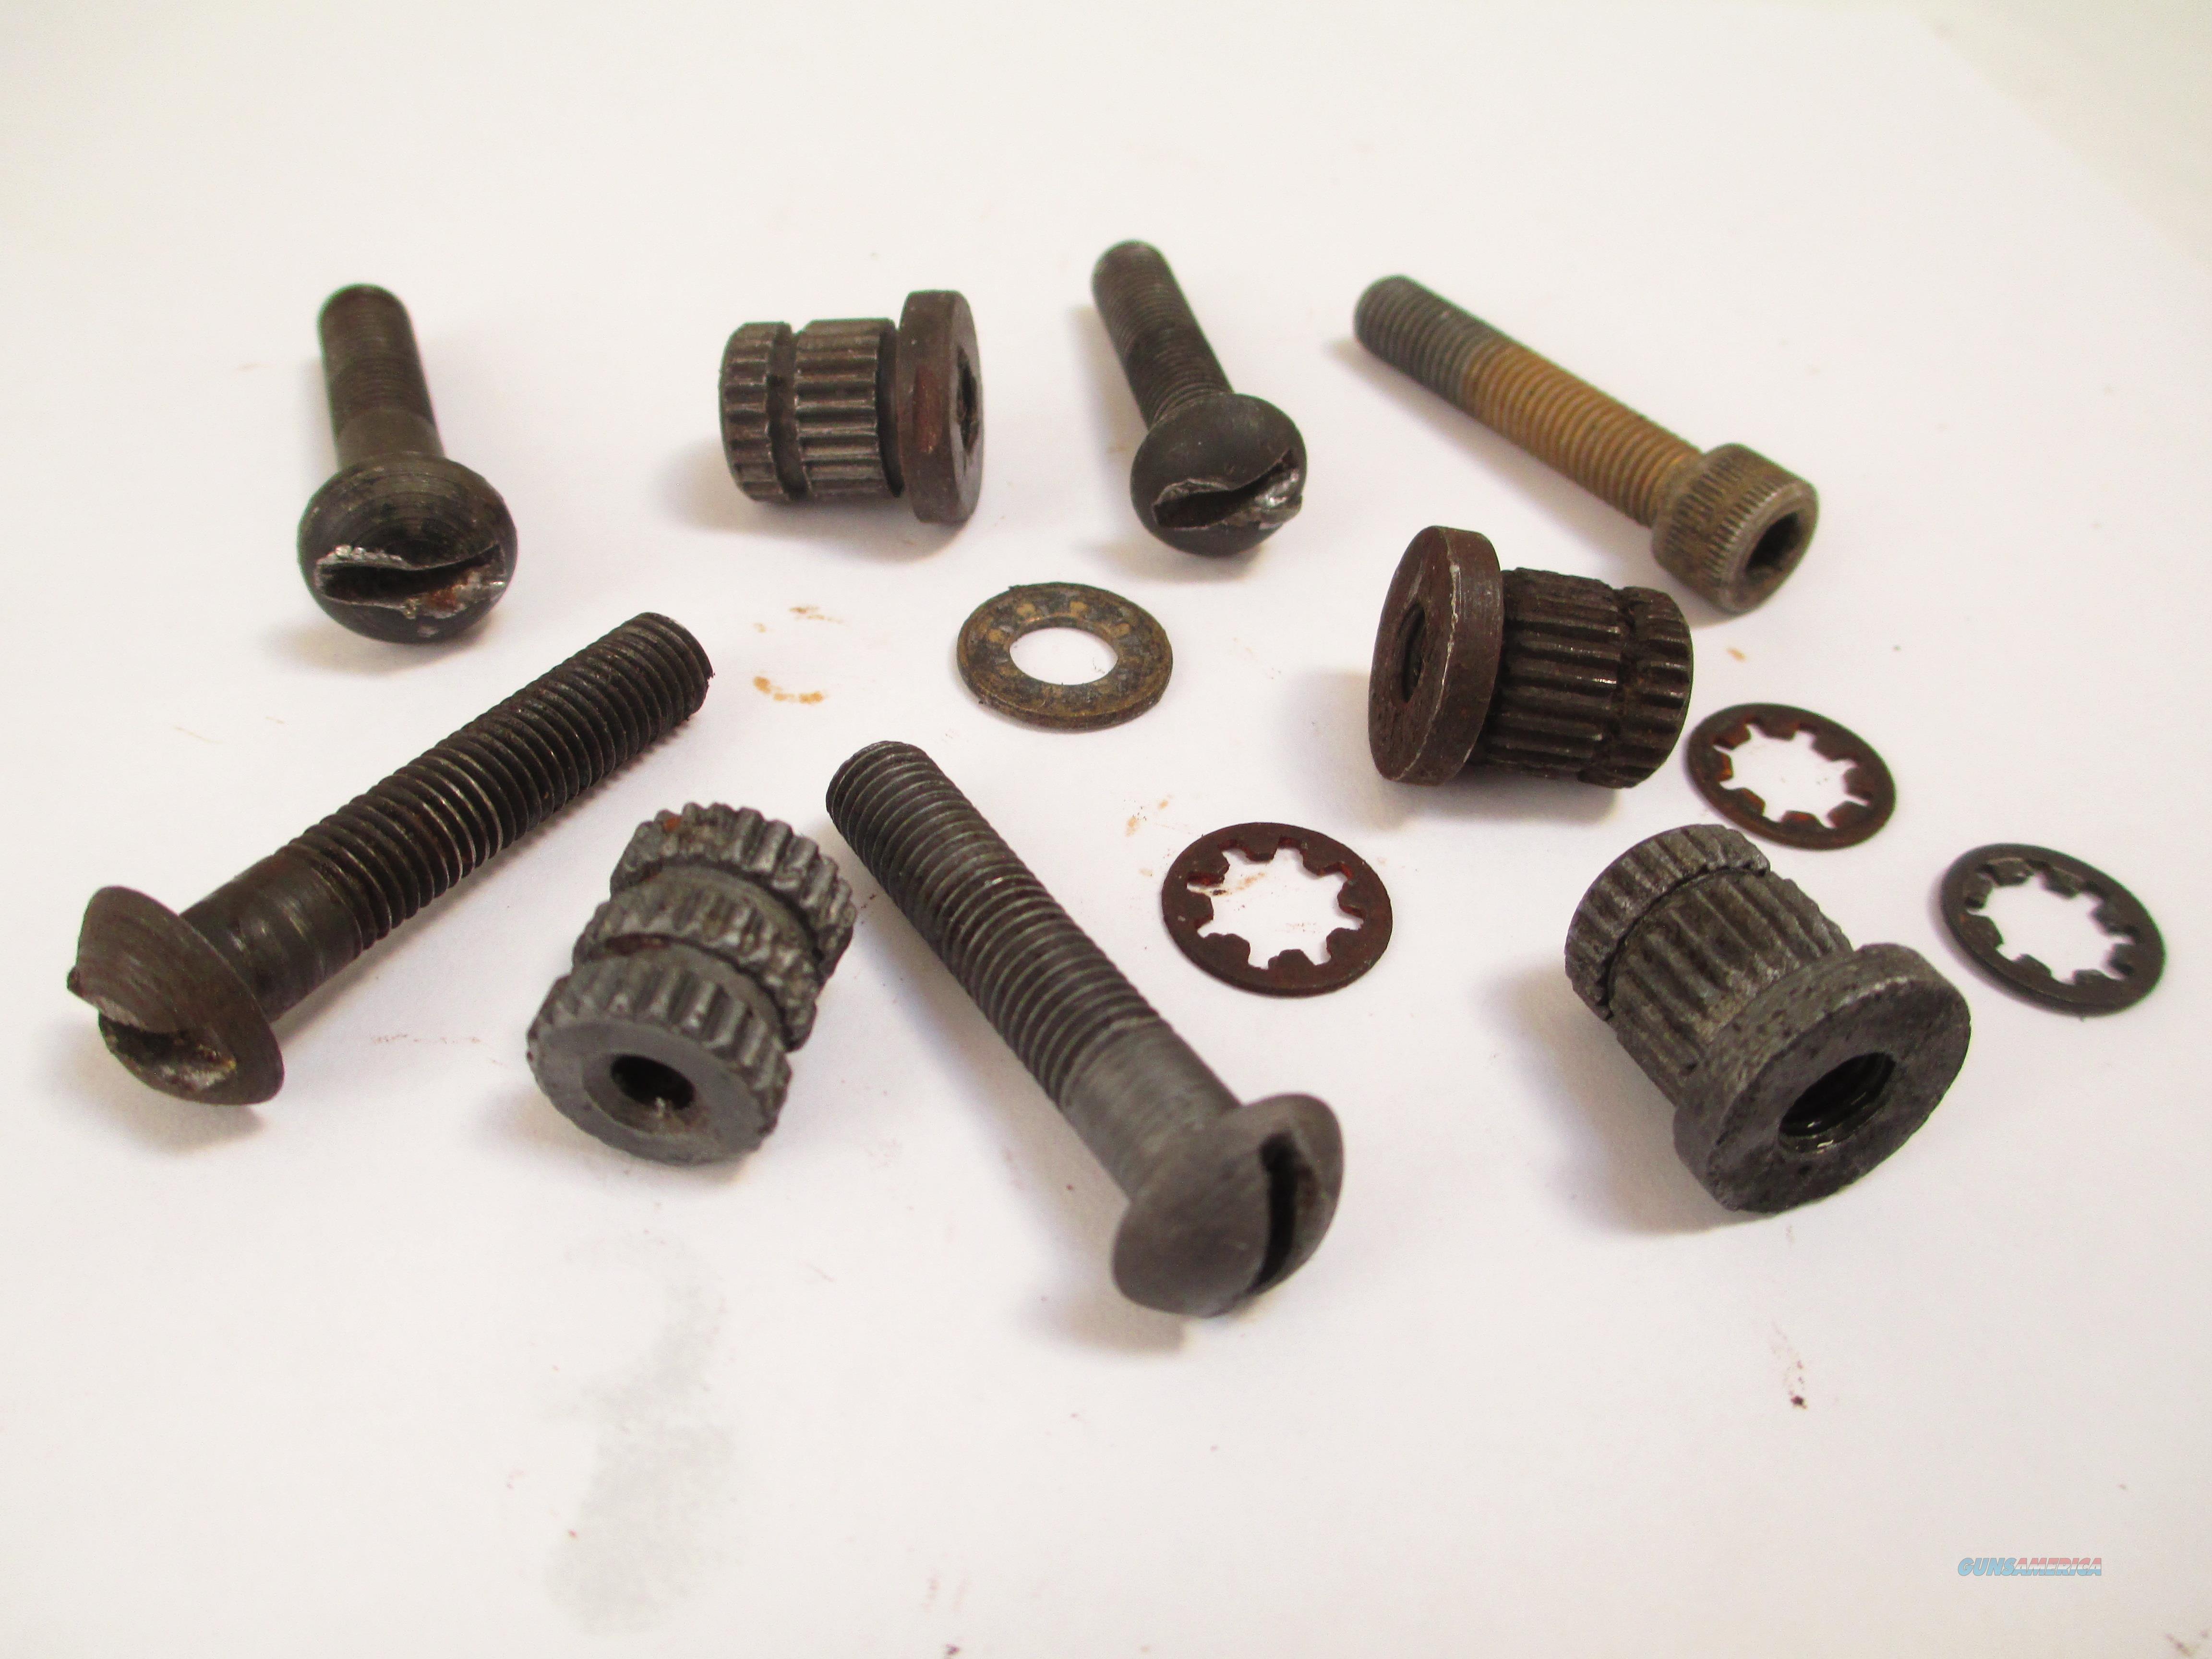 L1A1 BRITISH Pistol Grip Cover Bushing, .50  & Pistol Grip Screw Bushing  Non-Guns > Gun Parts > Military - Foreign